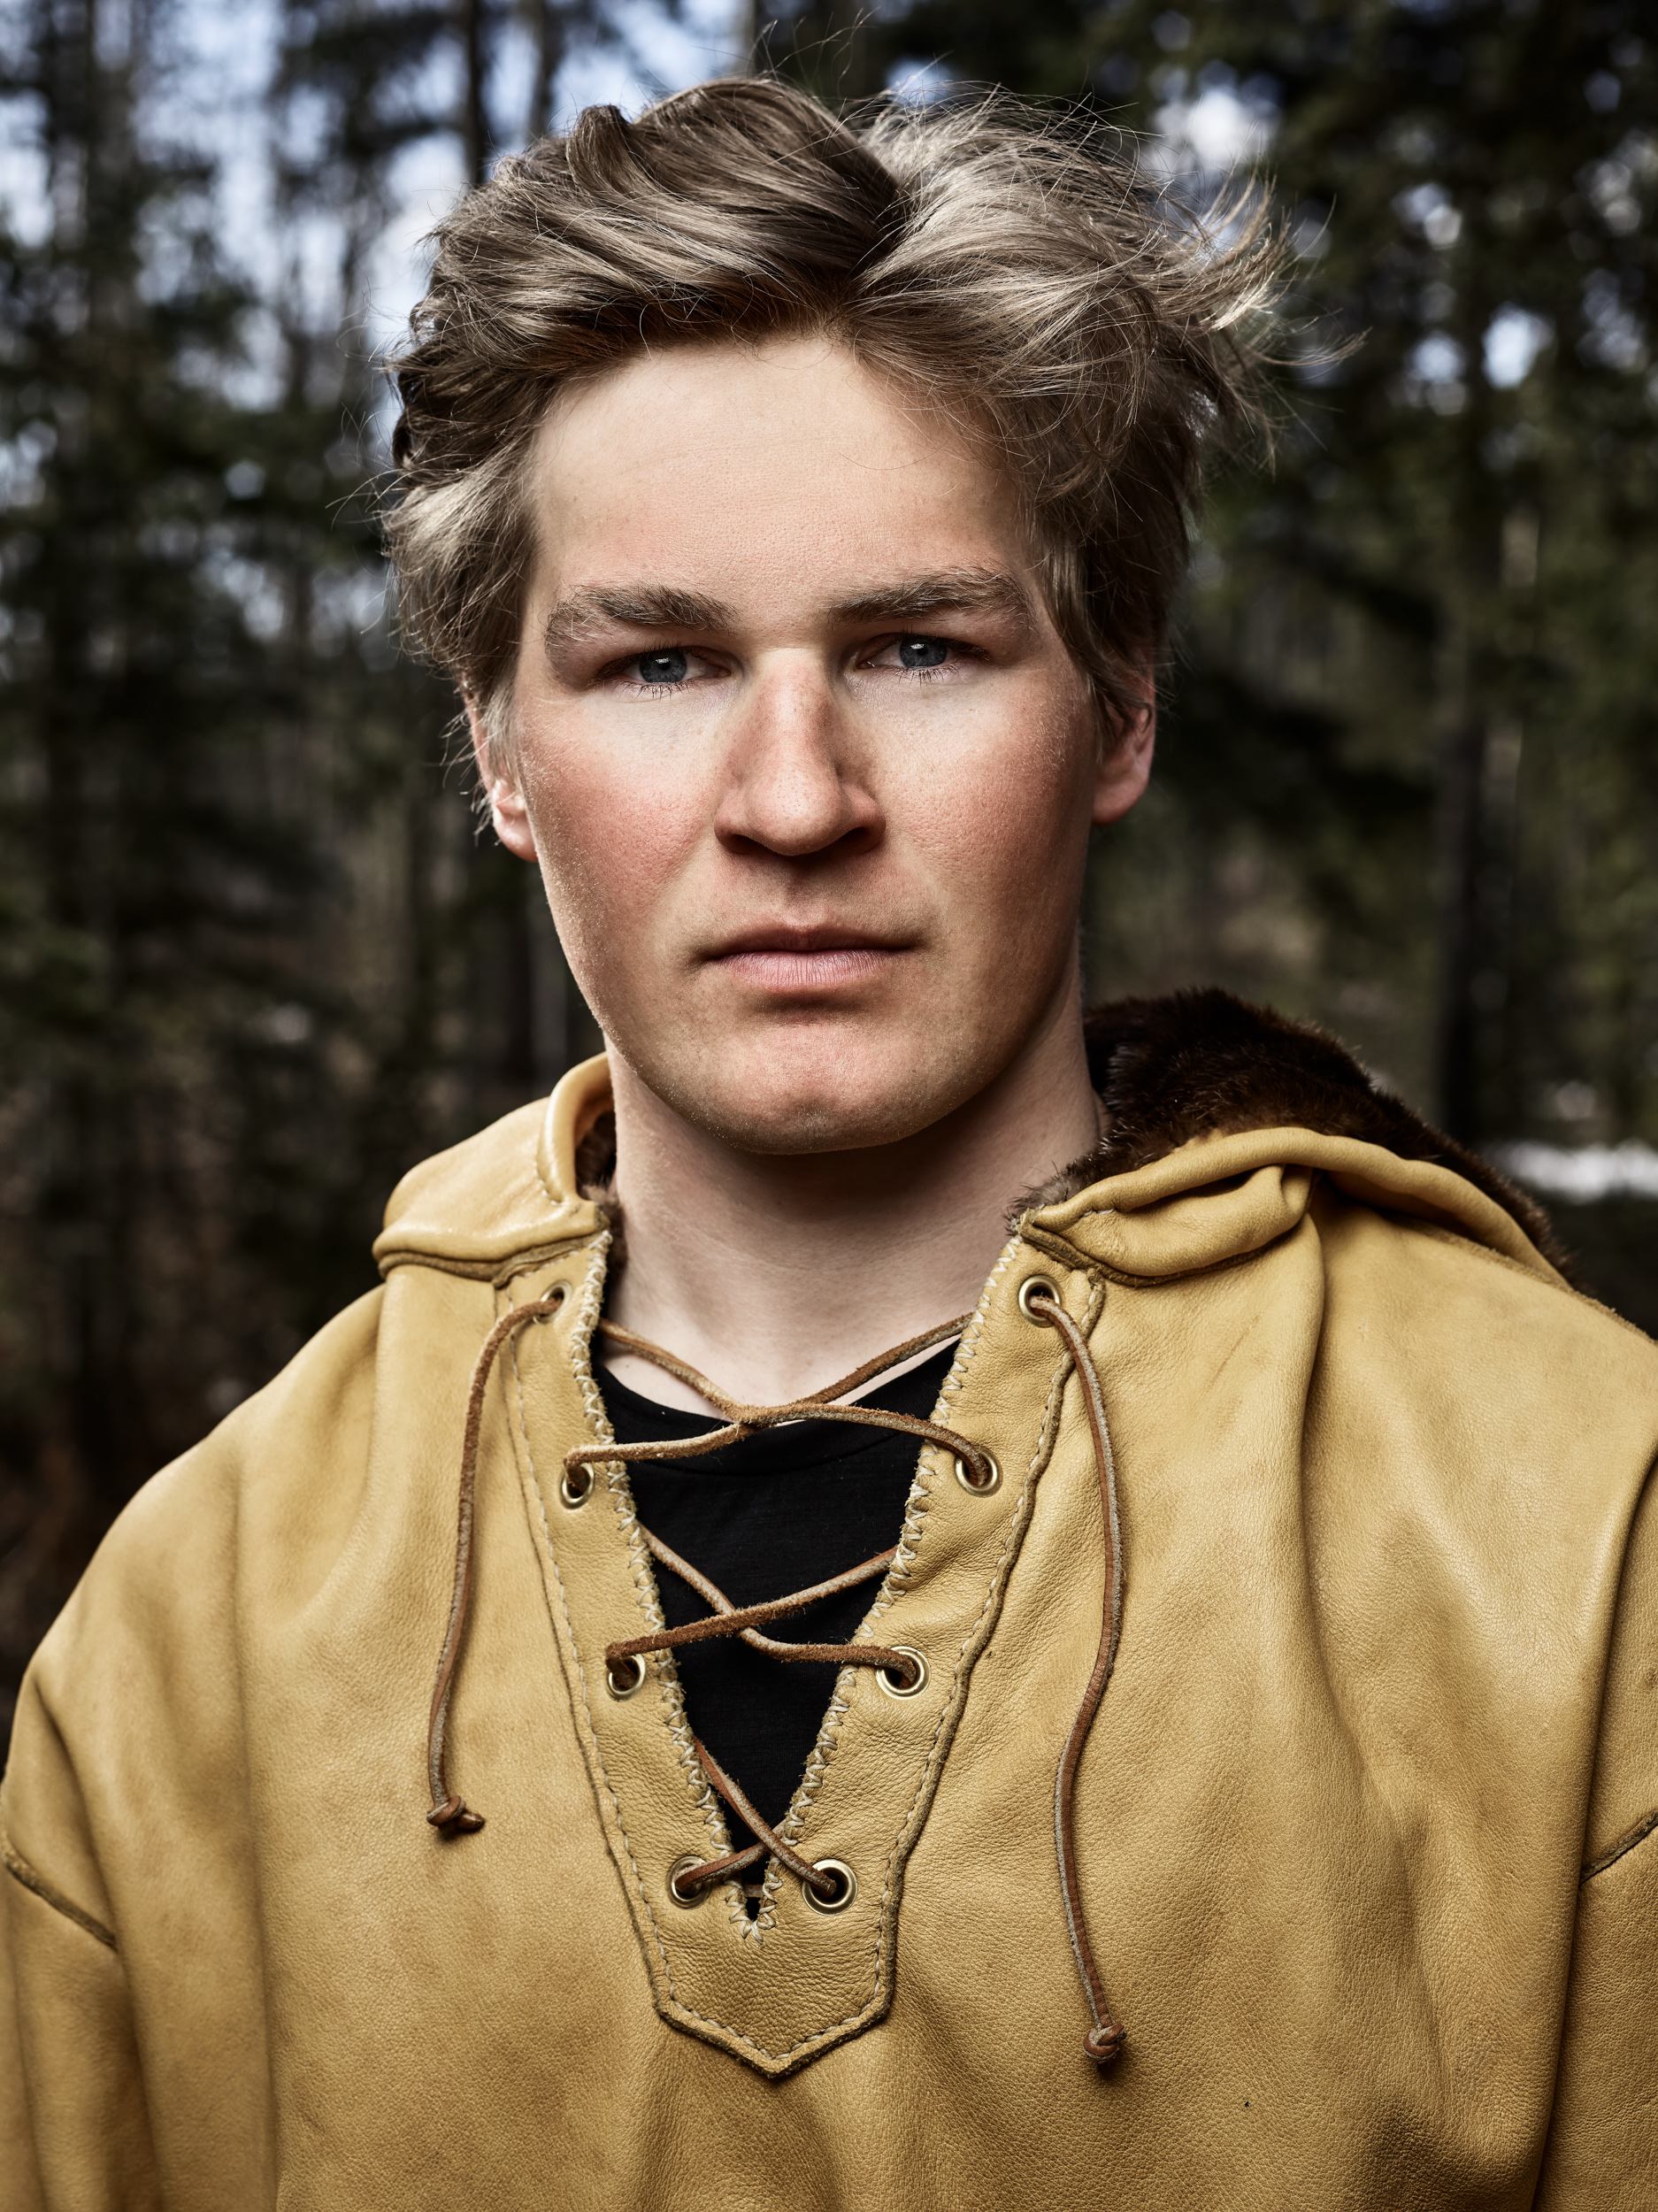 Commercial Editorial Portrait Photographer Canada